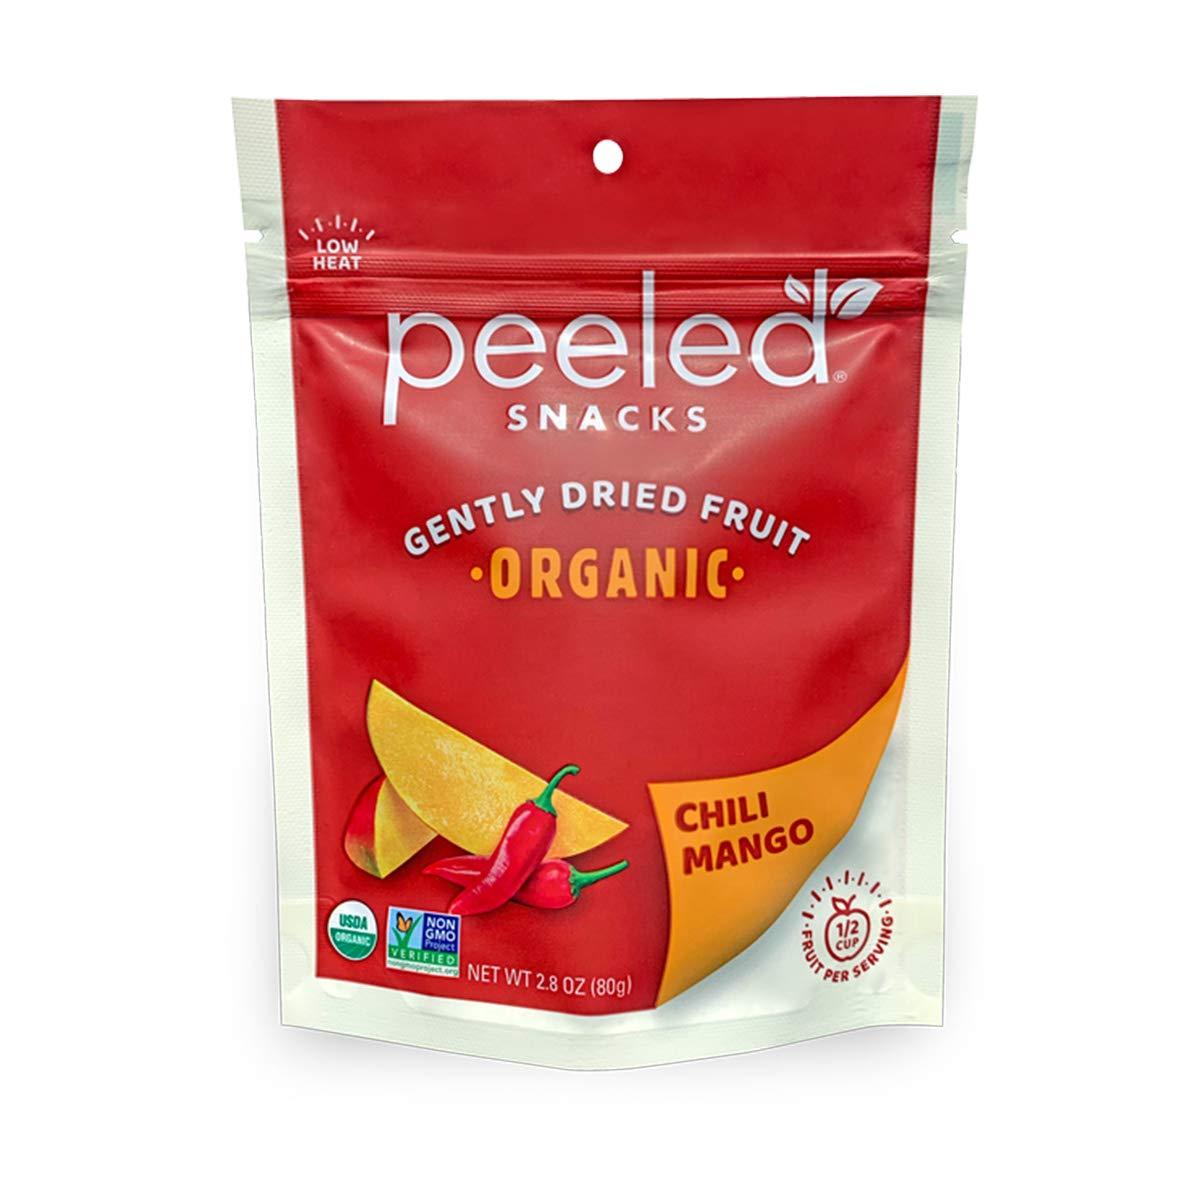 Peeled Snacks Organic Dried Fruit, Chili Mango, 2.8 Ounce (Pack of 12) by Peeled Snacks